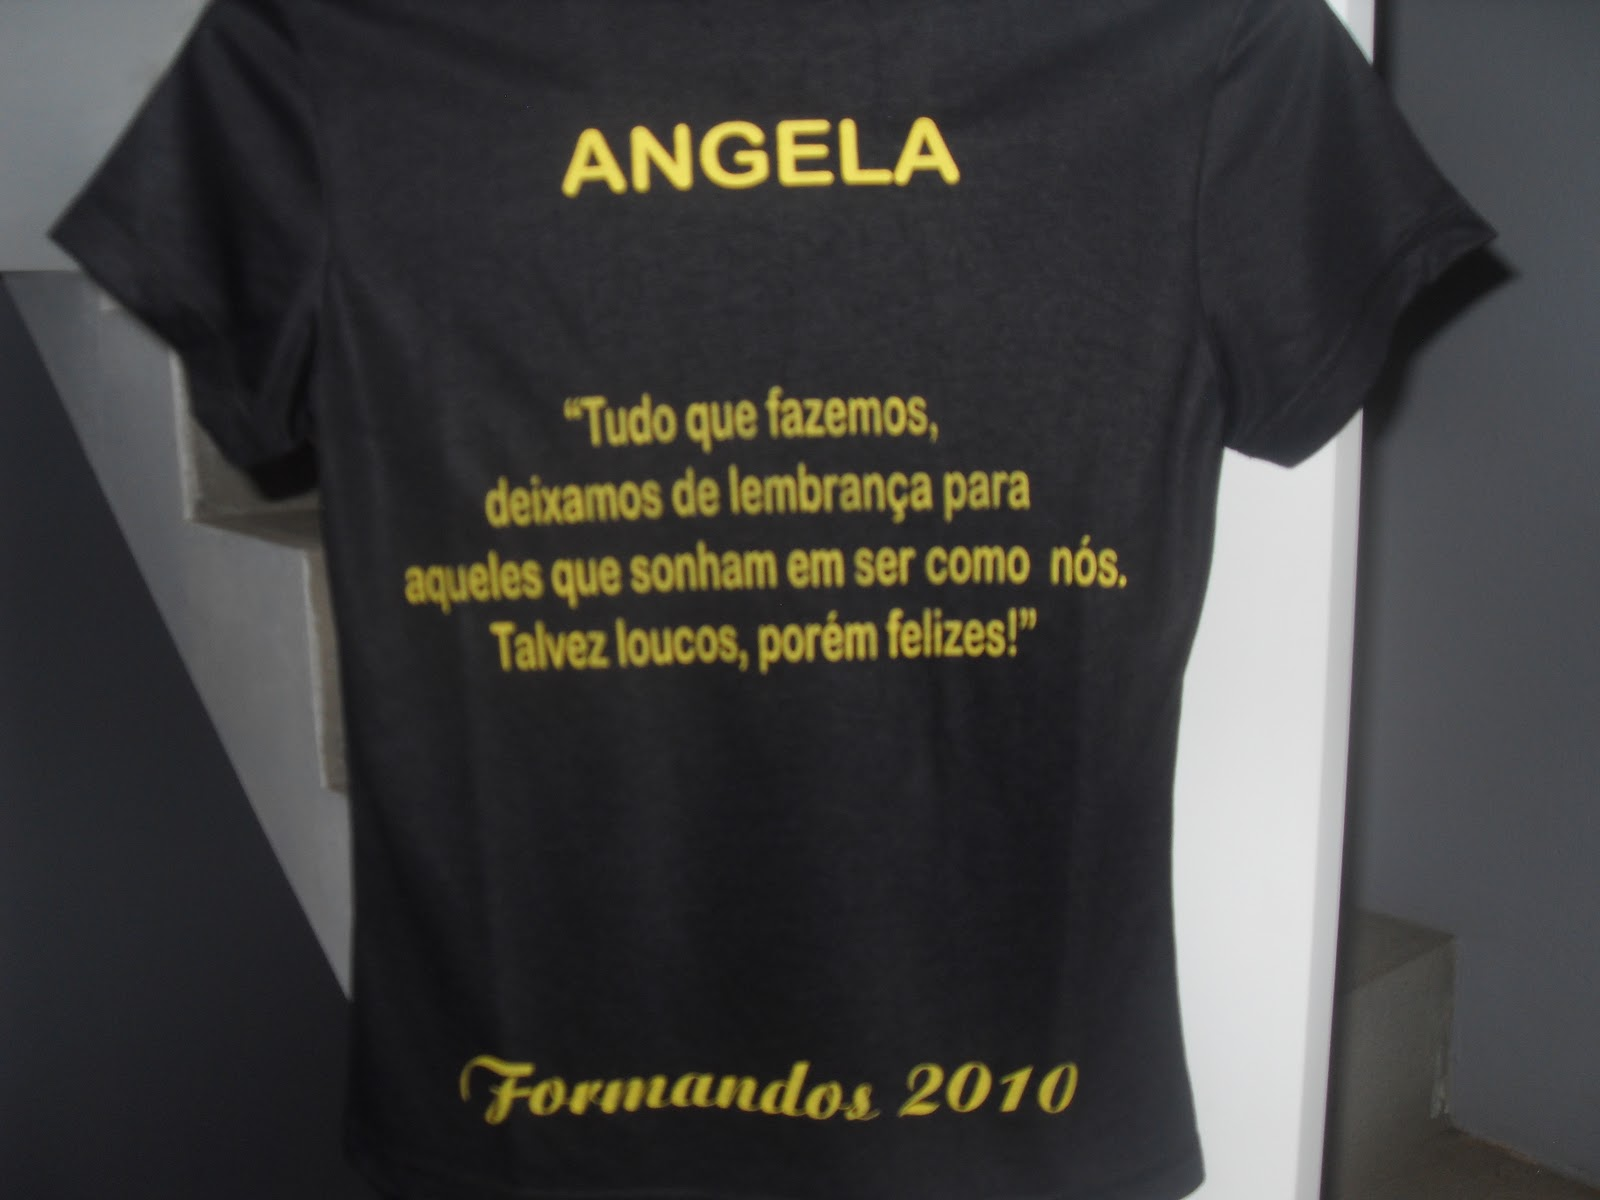 f952fb1123 Camiseta Da Formatura Frases Para Camisetas De Formandos 9 Ano  Kamiseta    Cia  Camisetas De Formandos